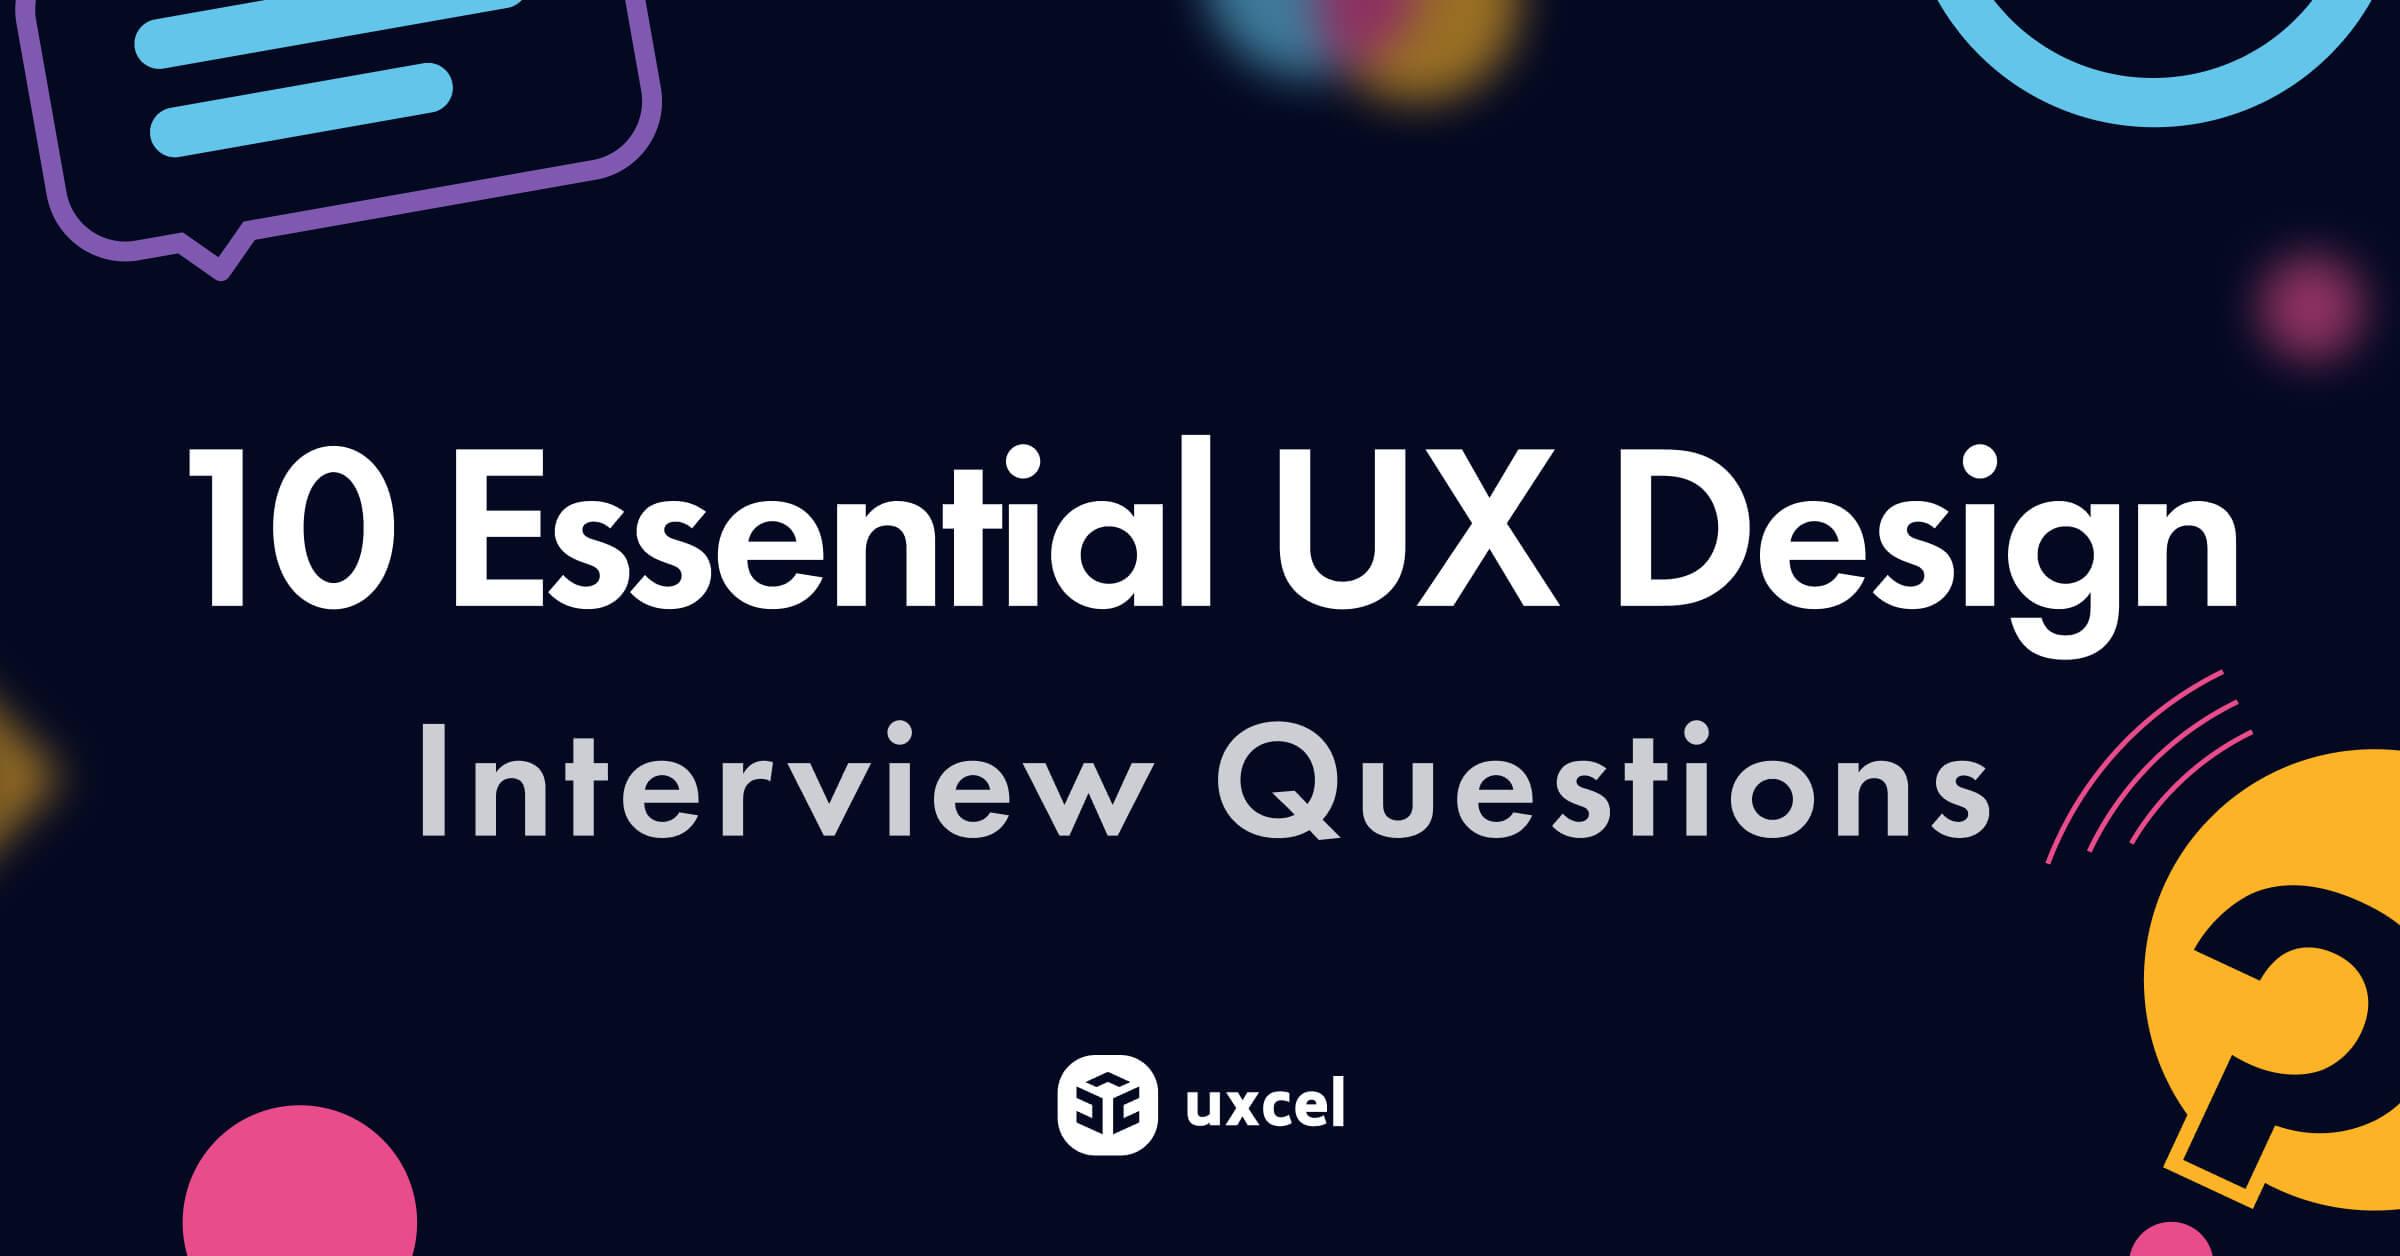 10 Essential UX Design Interview Questions